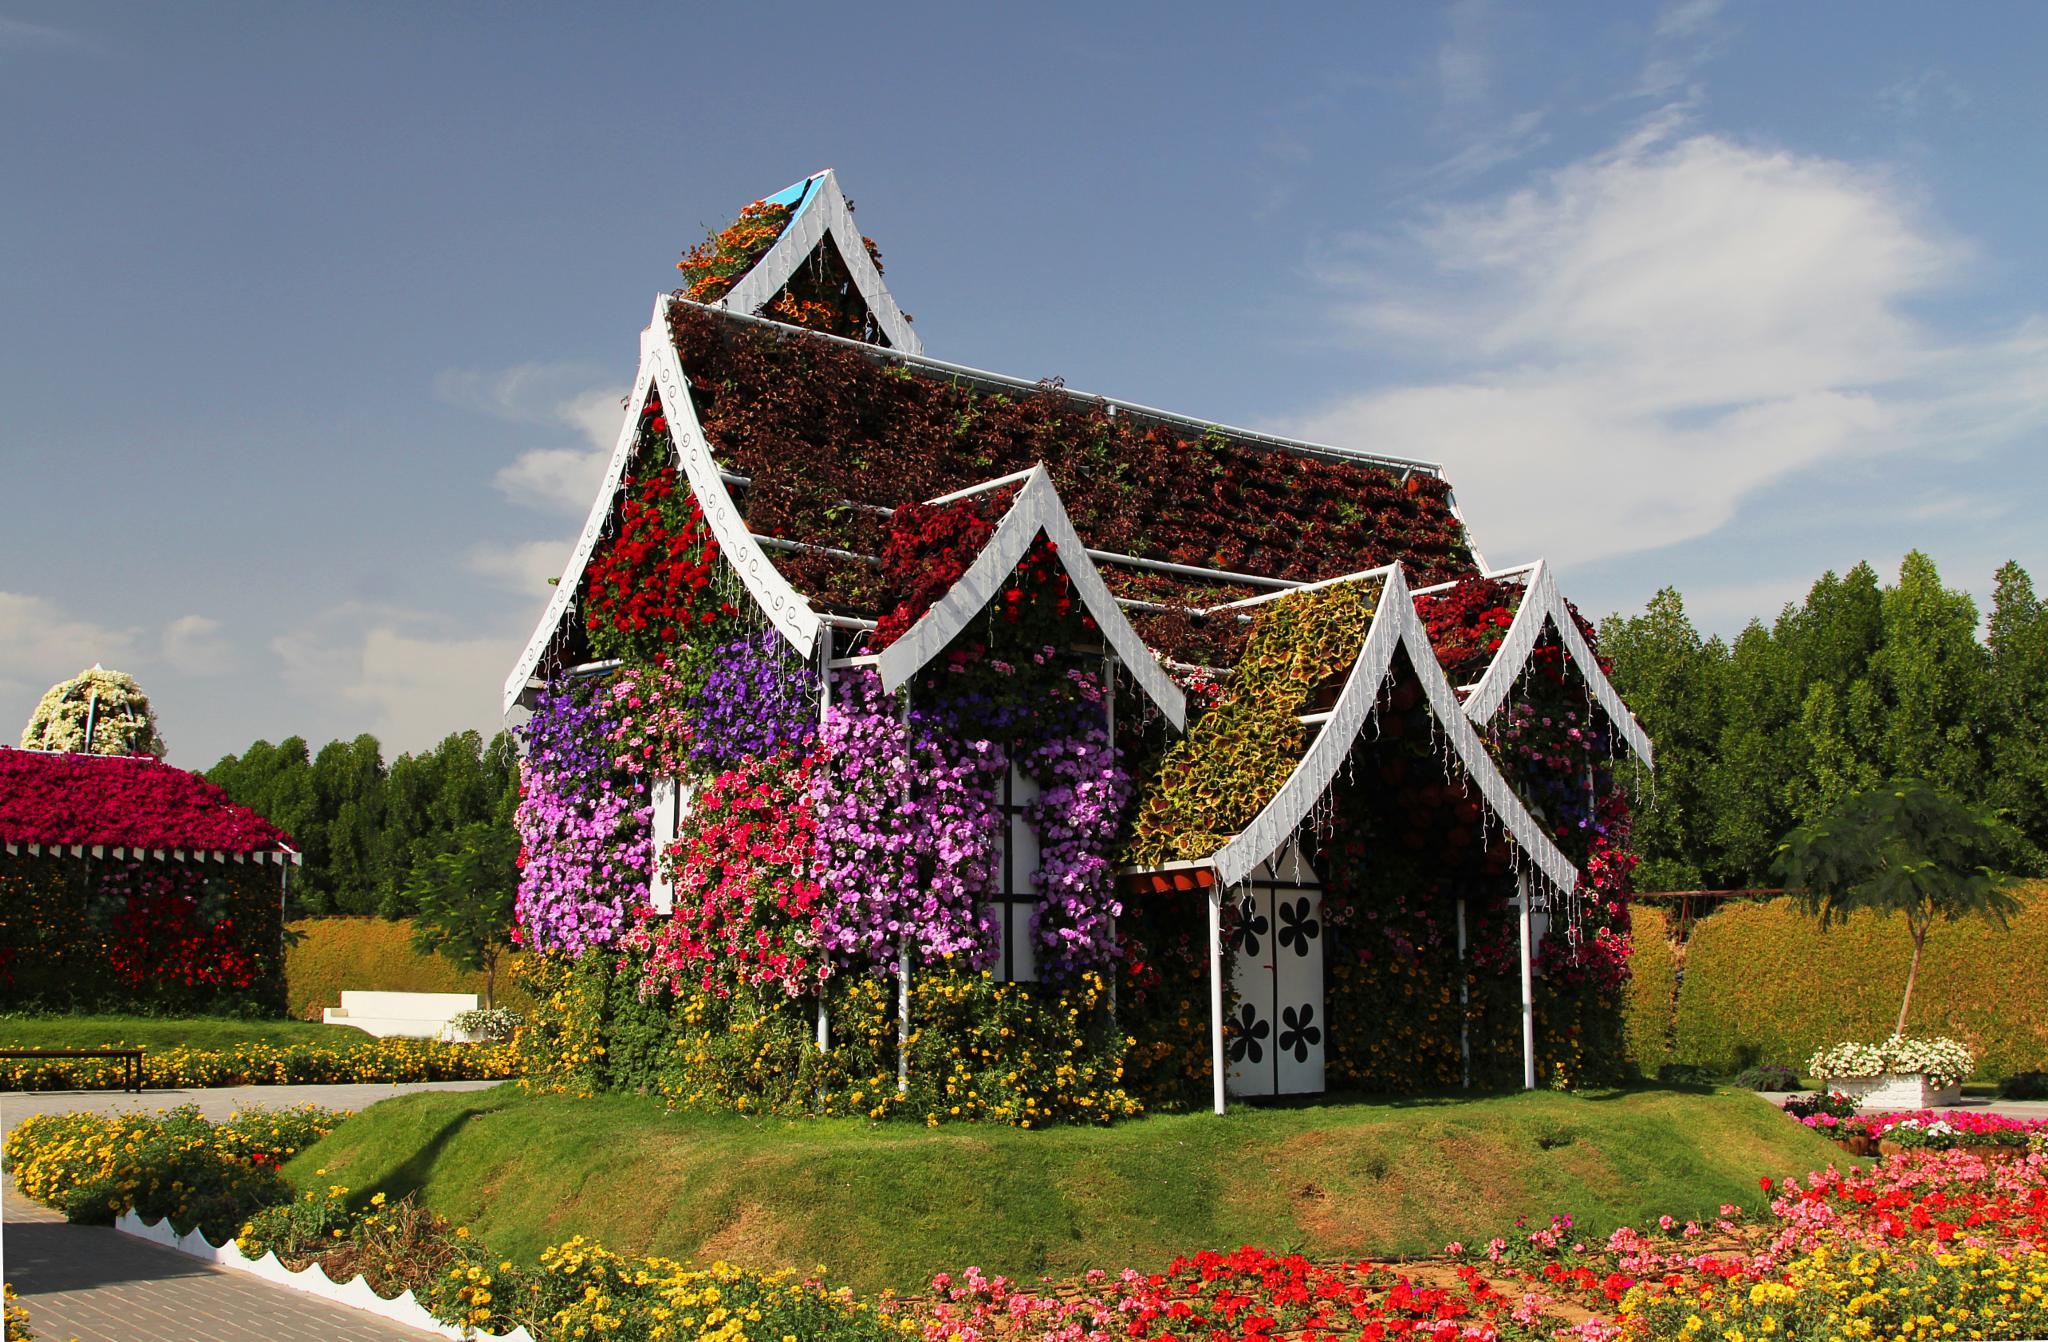 Flower House by Turan Arslan